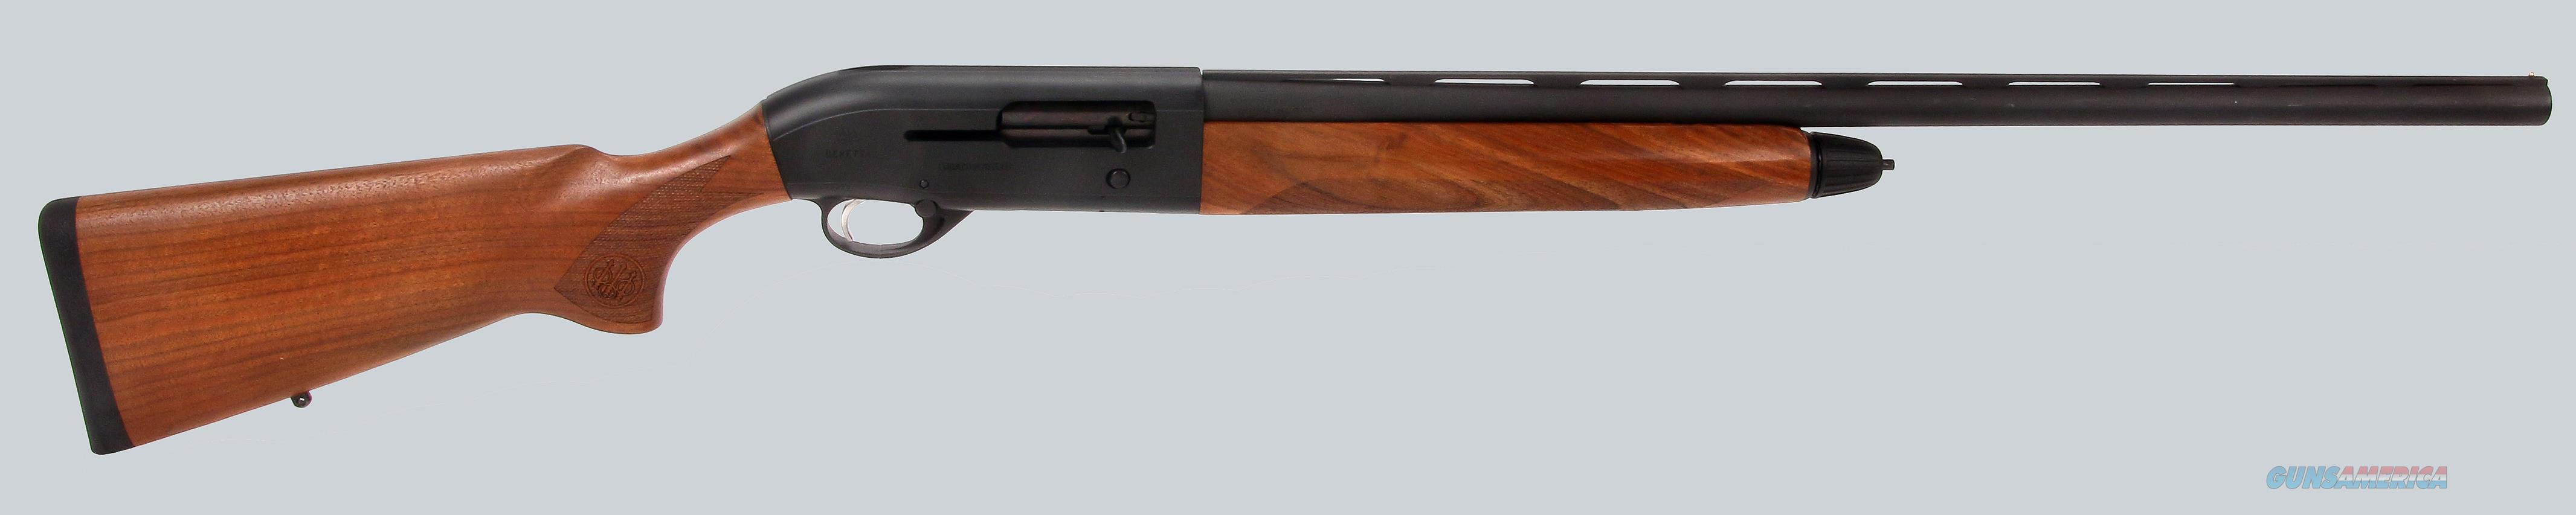 Beretta Autoloader A300 Outlander 12ga Shotgun  Guns > Shotguns > Beretta Shotguns > Autoloaders > Hunting